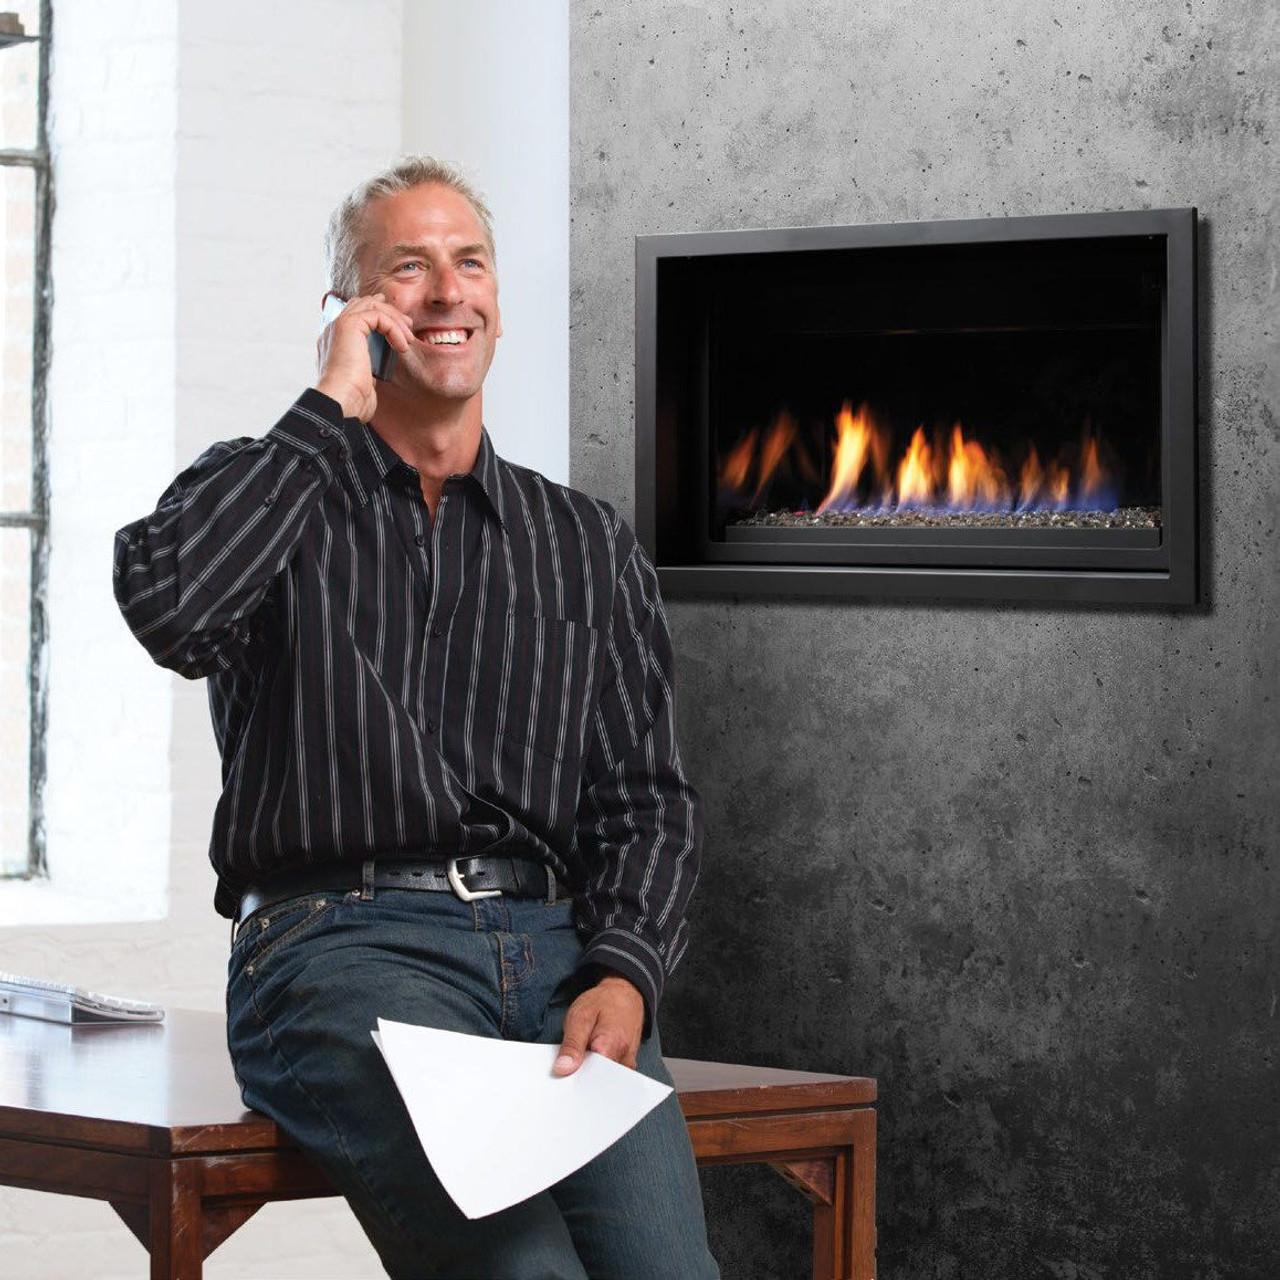 White Kingsman Linear Gas Fireplace Package Kingsman Inch Linear Gas Fireplace Package Deal Linear Gas Fireplace See Through Linear Gas Fireplace Prices Canada houzz-03 Linear Gas Fireplace